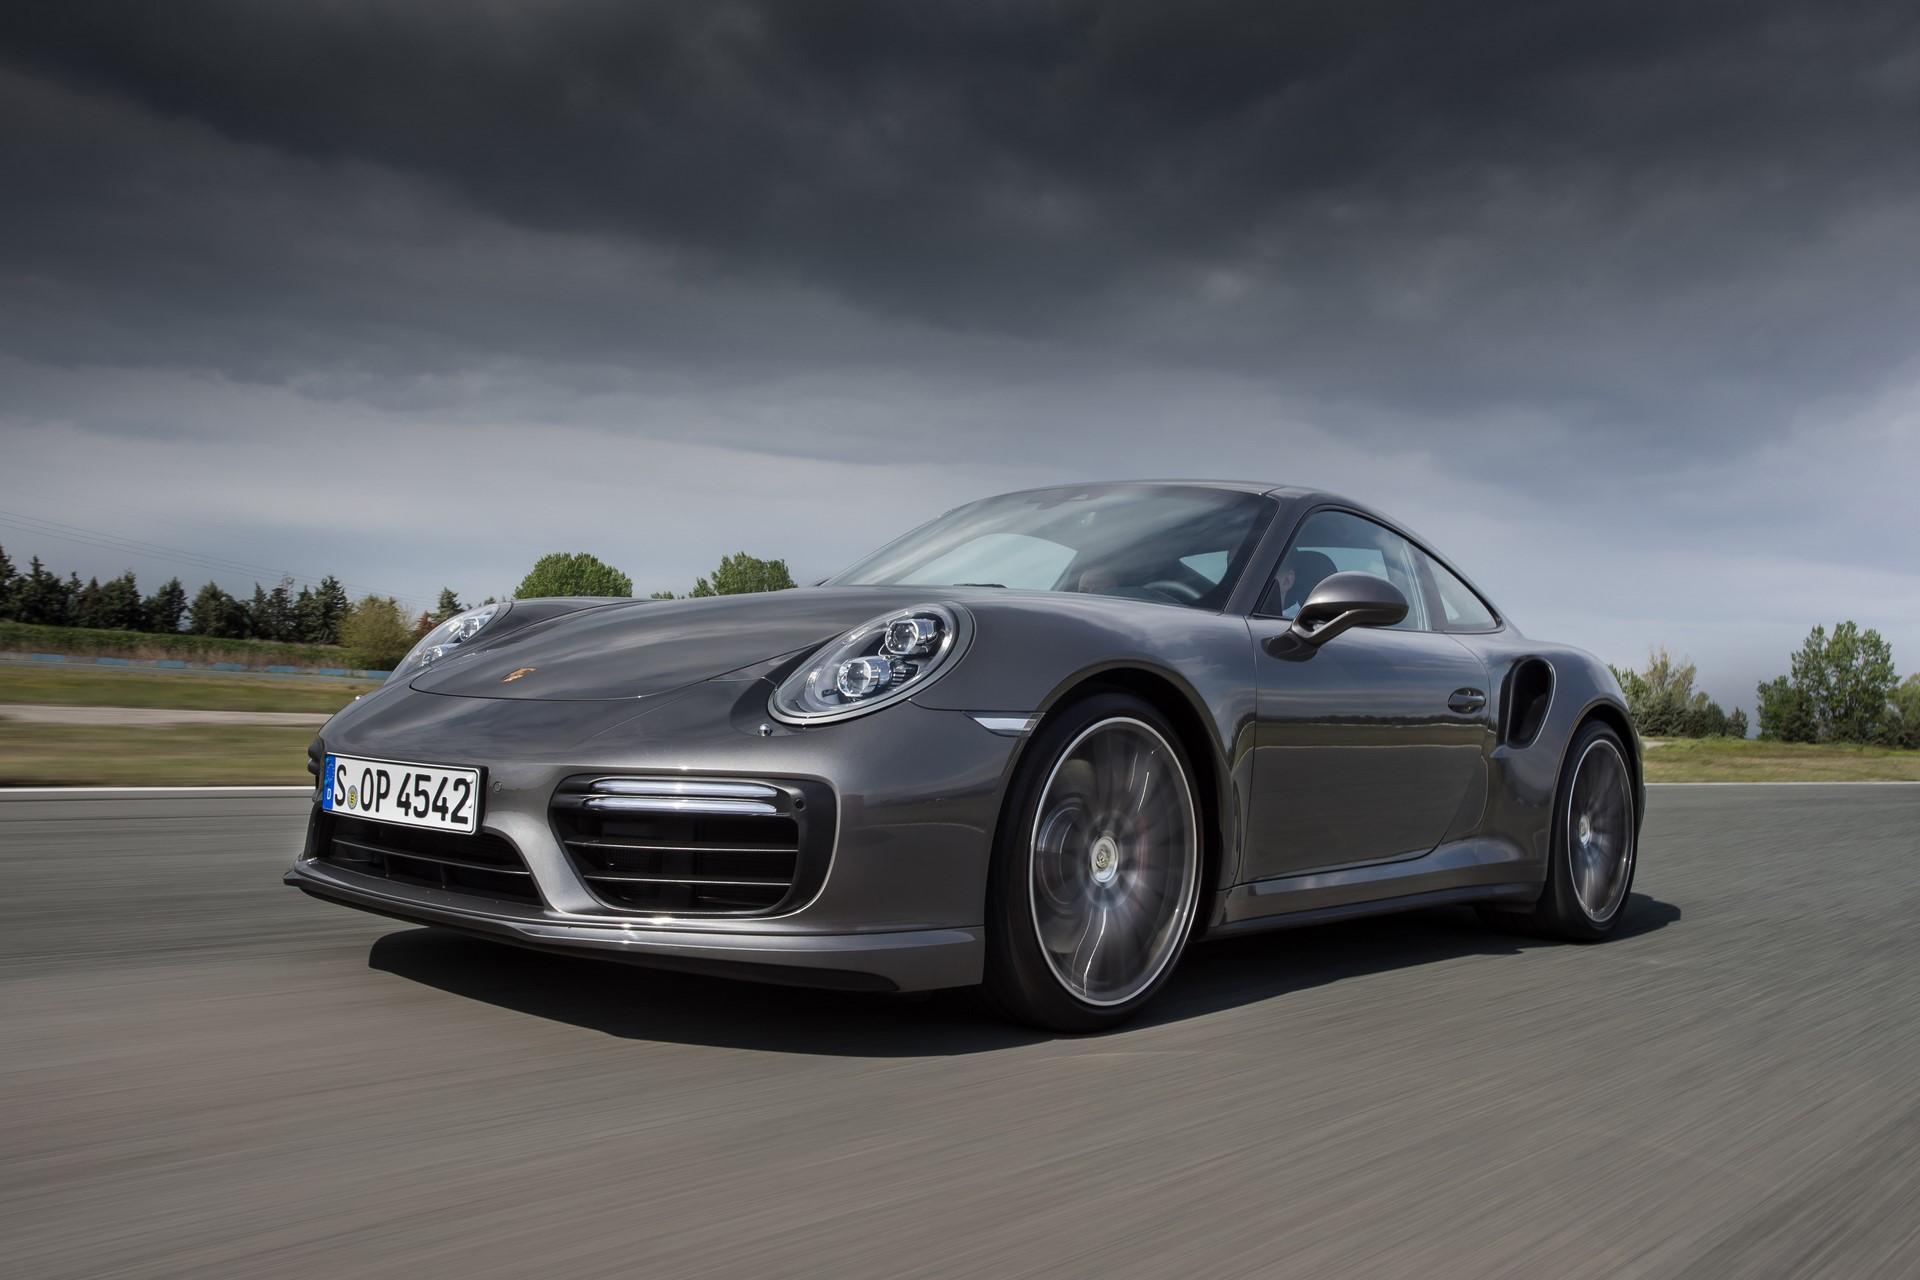 Porsche Driving Experience 2017 Serres (29)